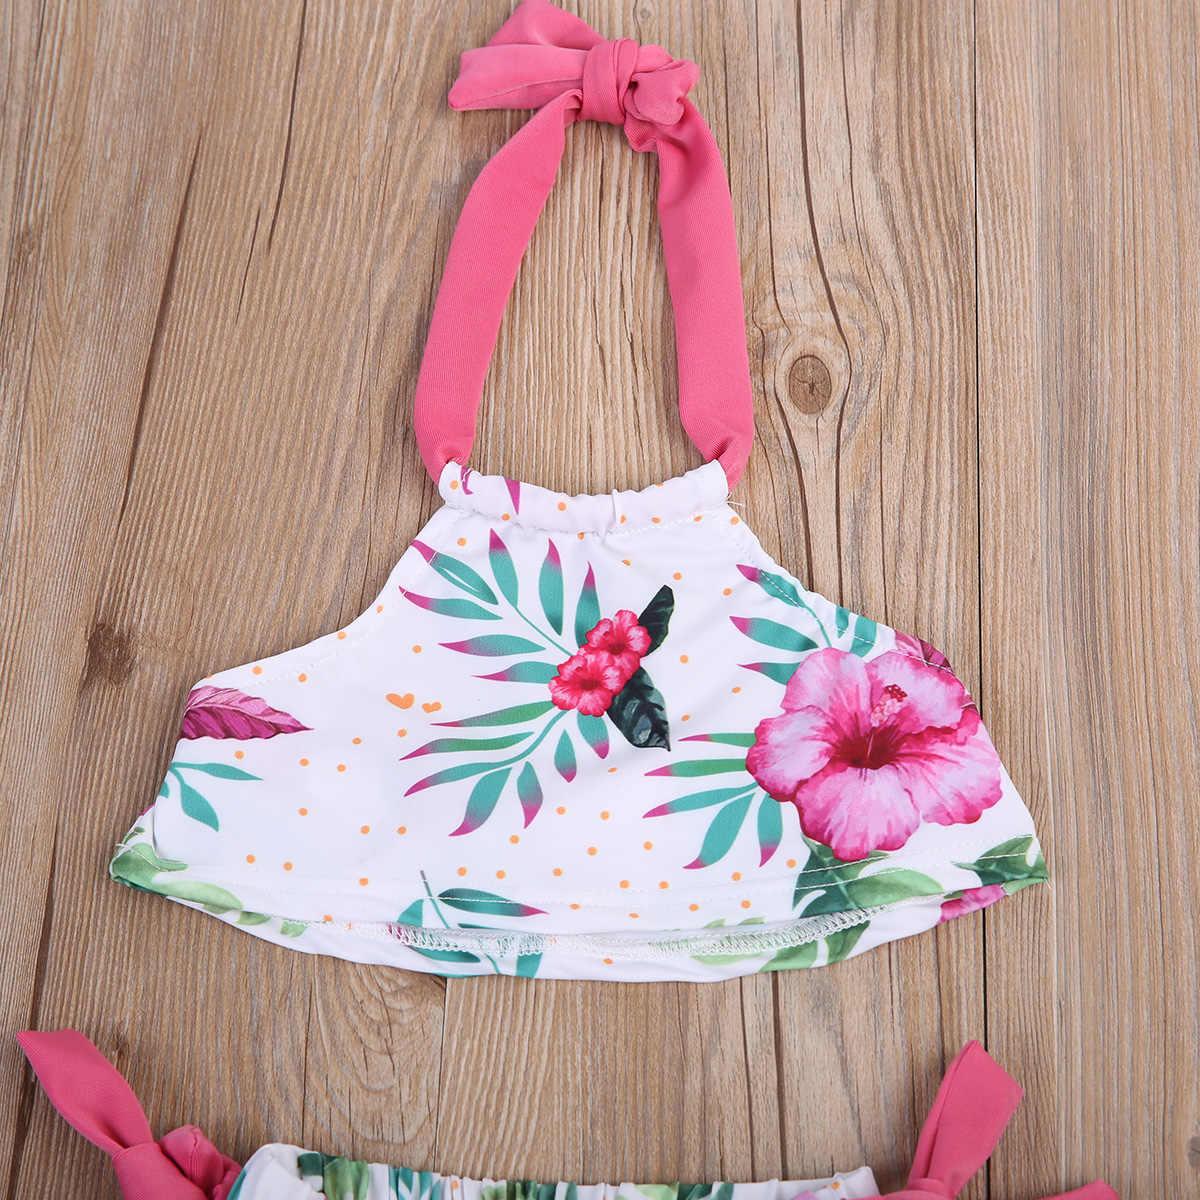 Musim panas Balita Perempuan Kids Pink Floral Putih Indah Lucu Cukup Swimsuit Bathing Tankini Bikini Set Swimwear Beachwear